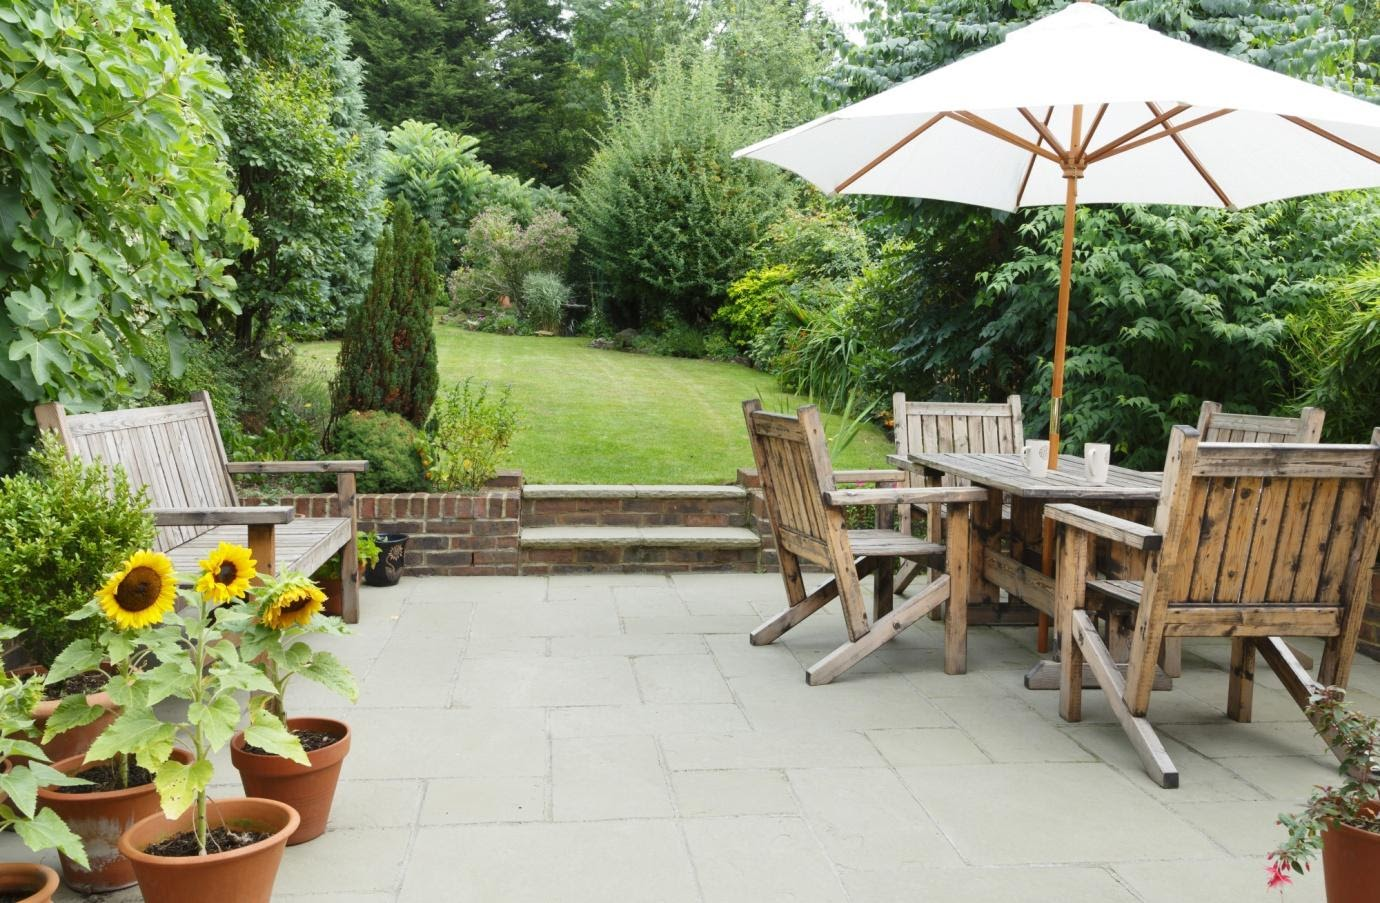 5 Backyard Improvements You Should Consider